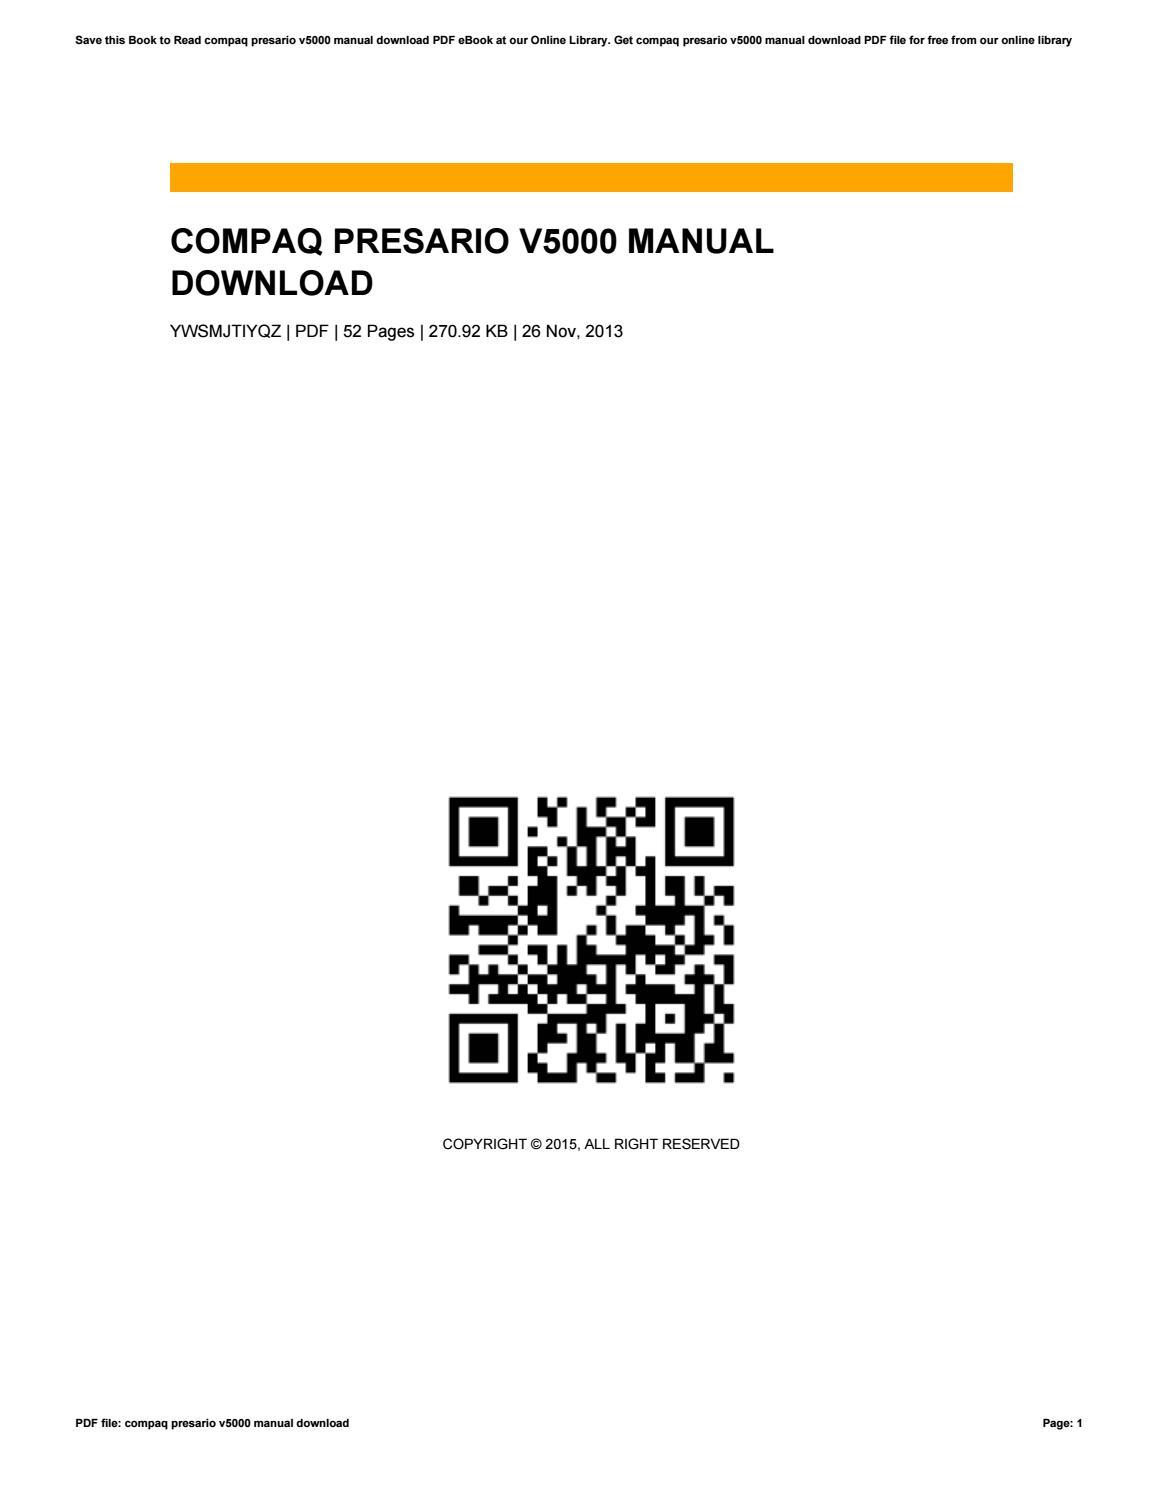 compaq presario v5000 drivers for windows 7 free download